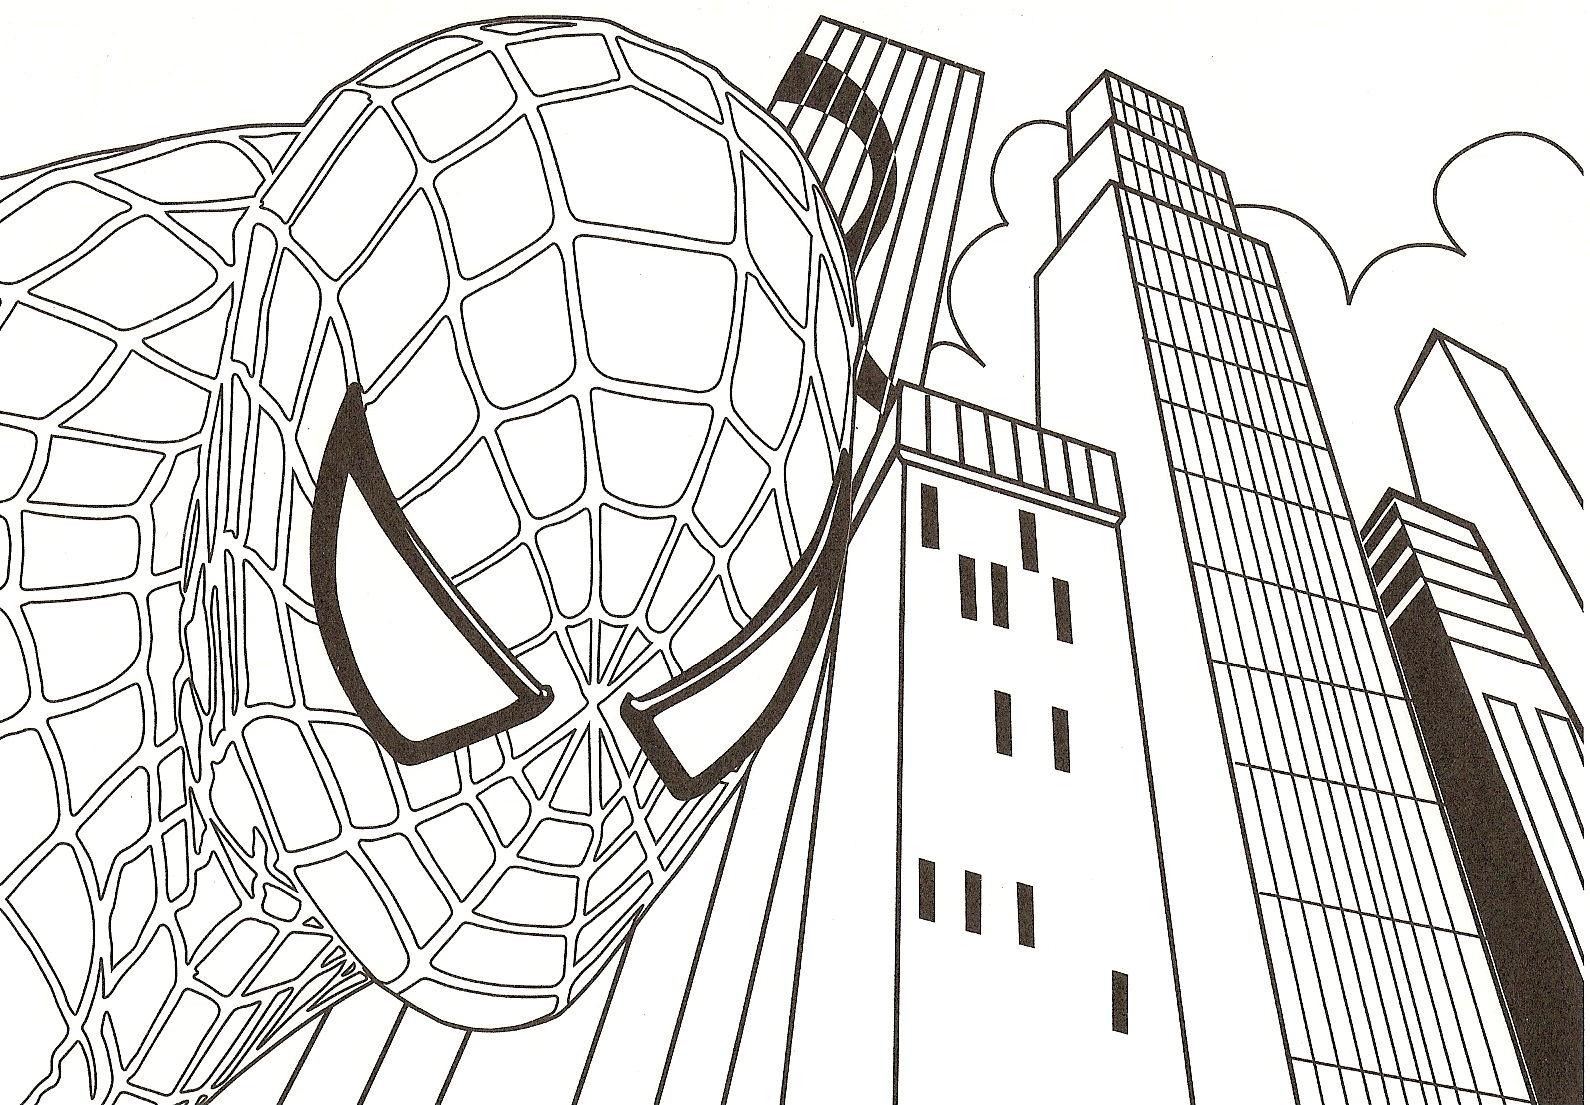 Dessins en couleurs imprimer spiderman num ro 18821 - Dessin spider man ...